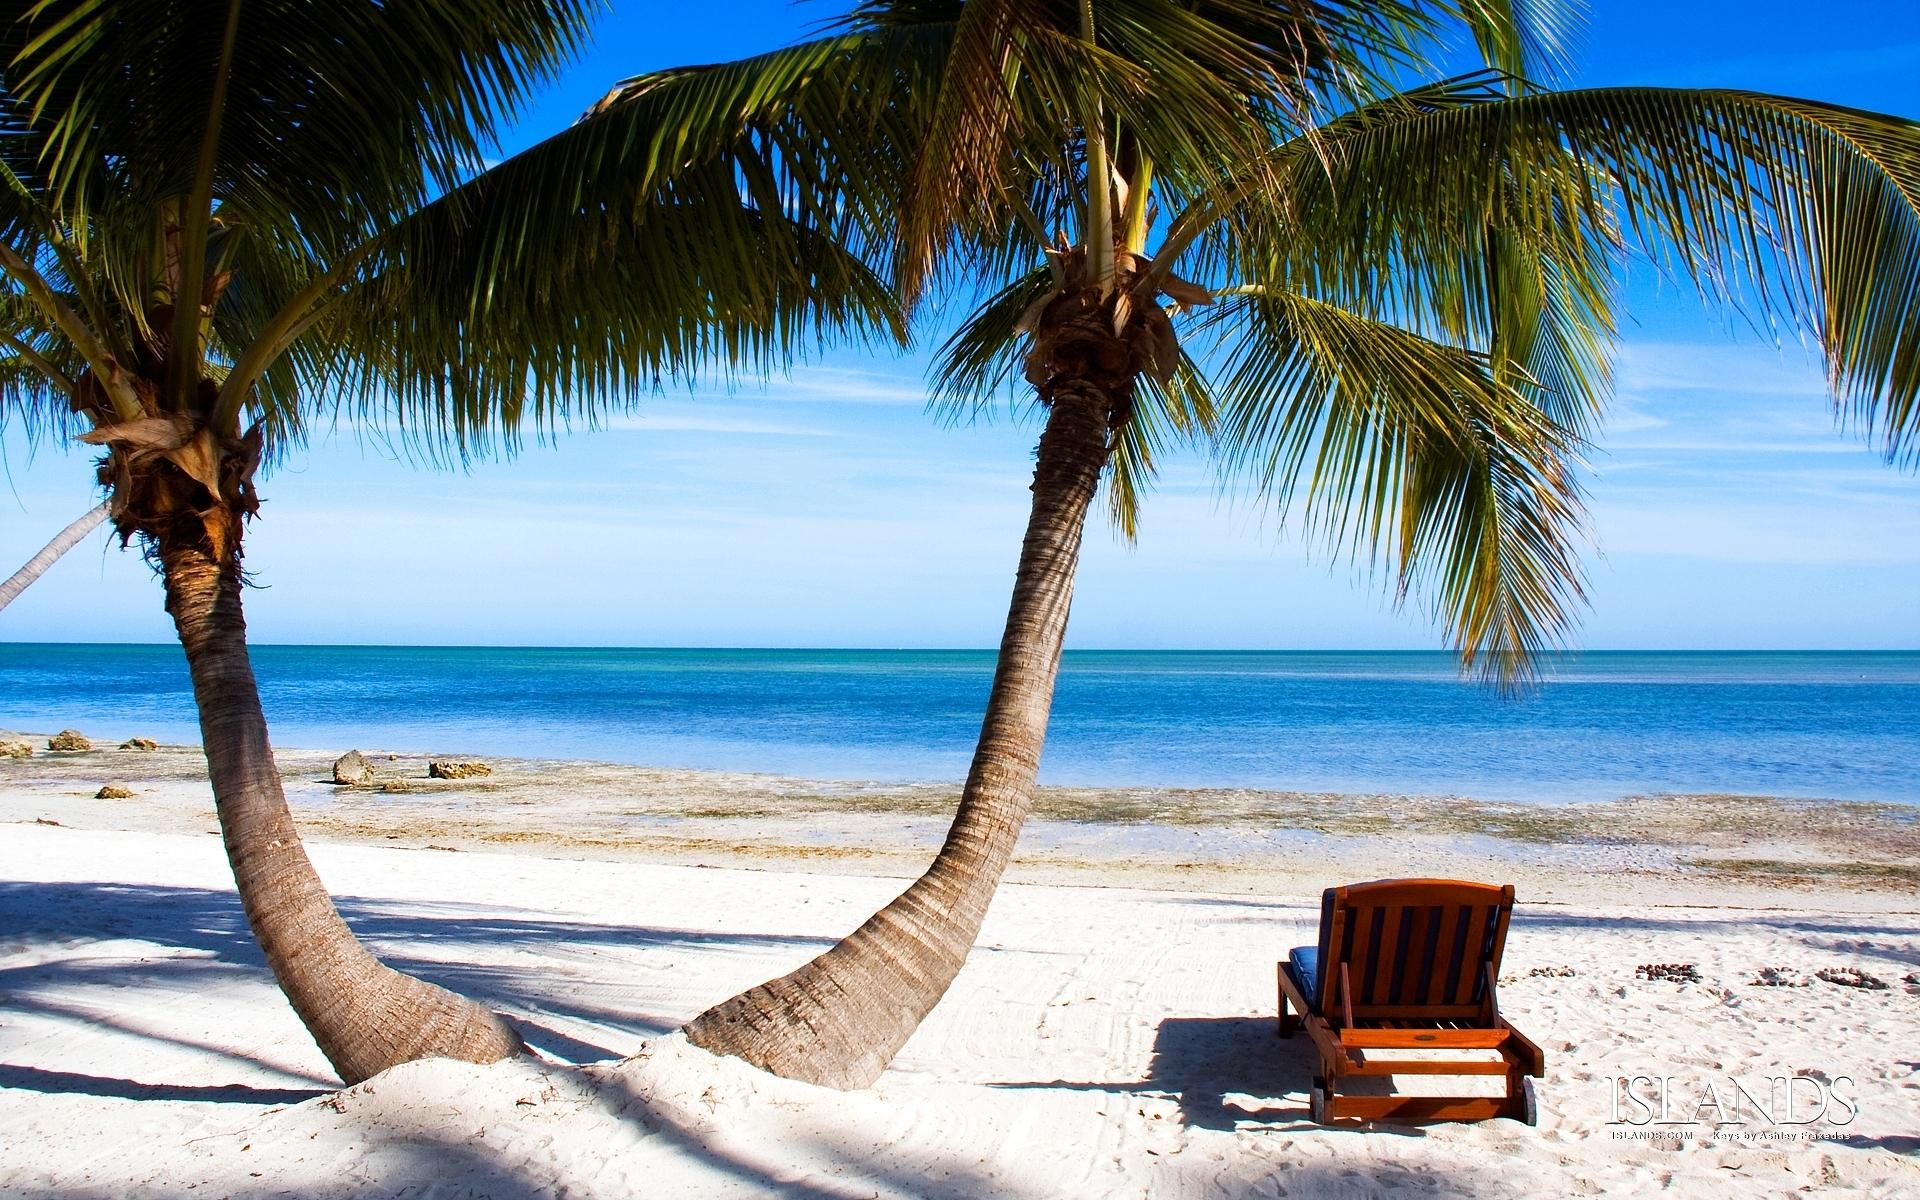 elegant florida beach wallpaper free   the most beautiful beach